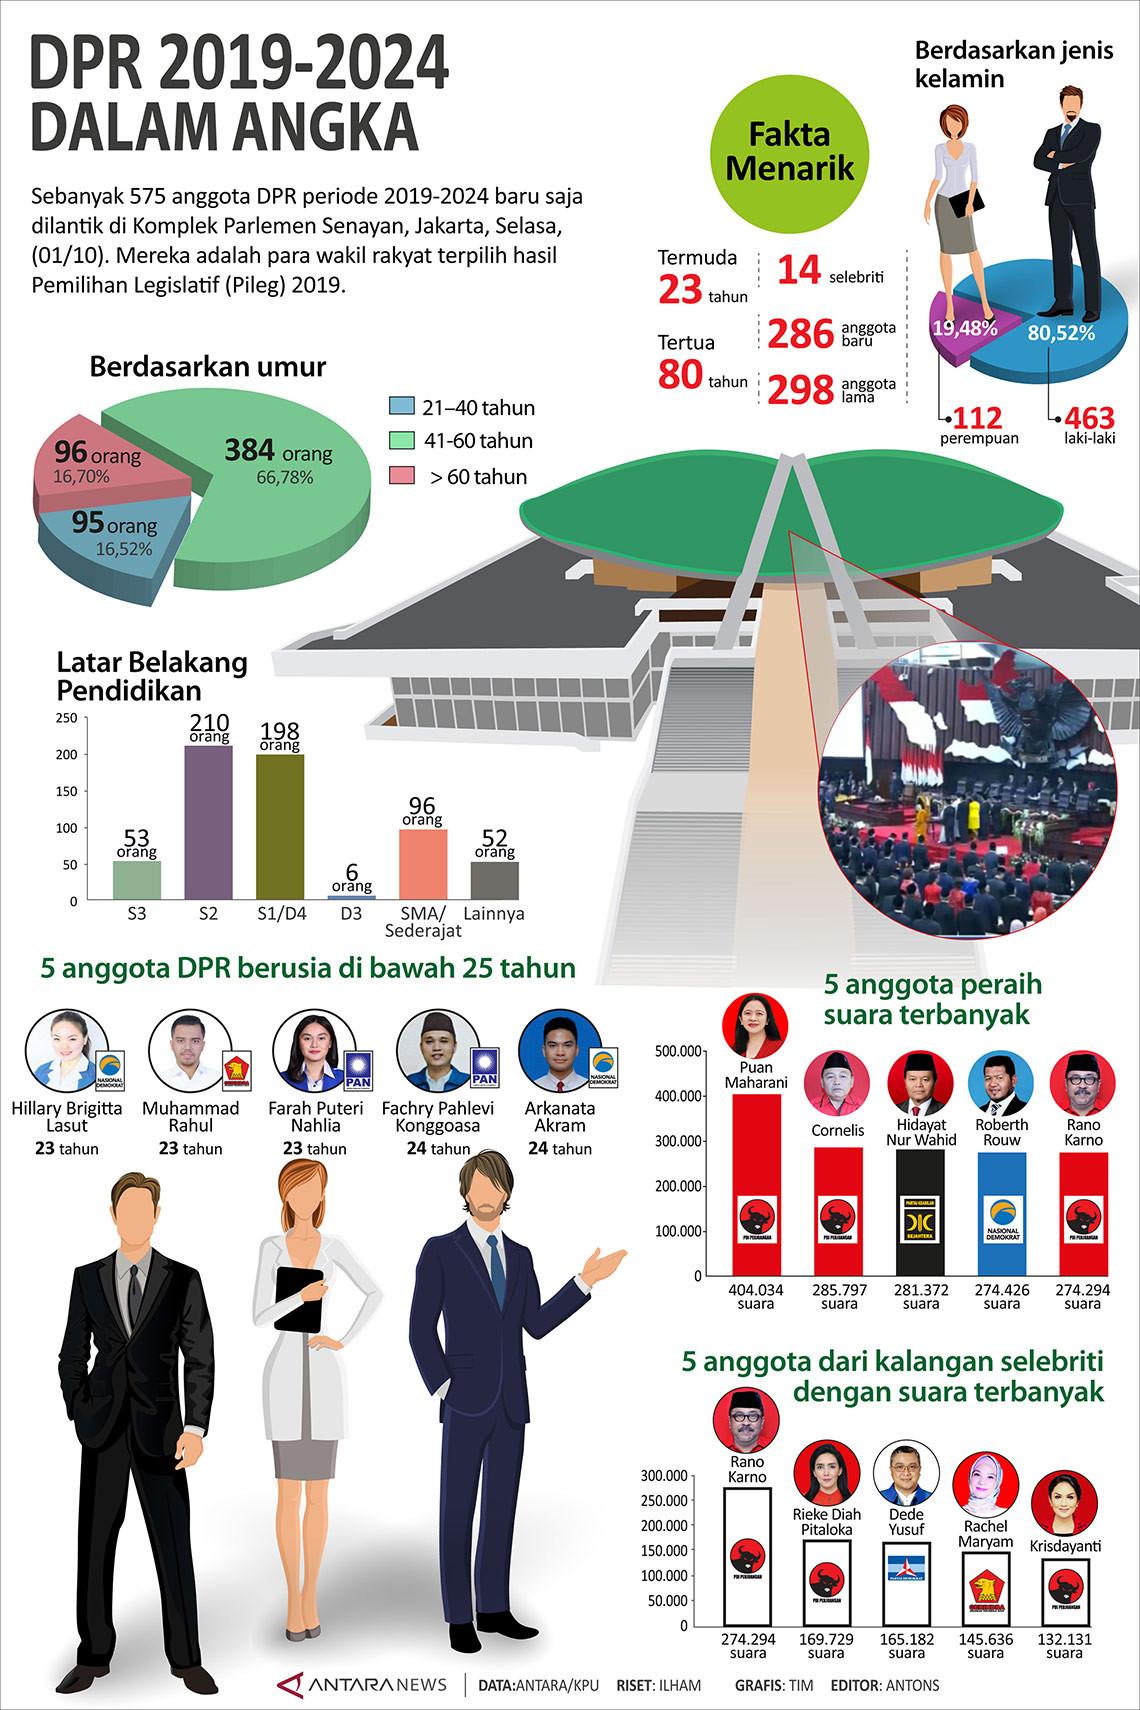 DPR 2019-2024 dalam angka